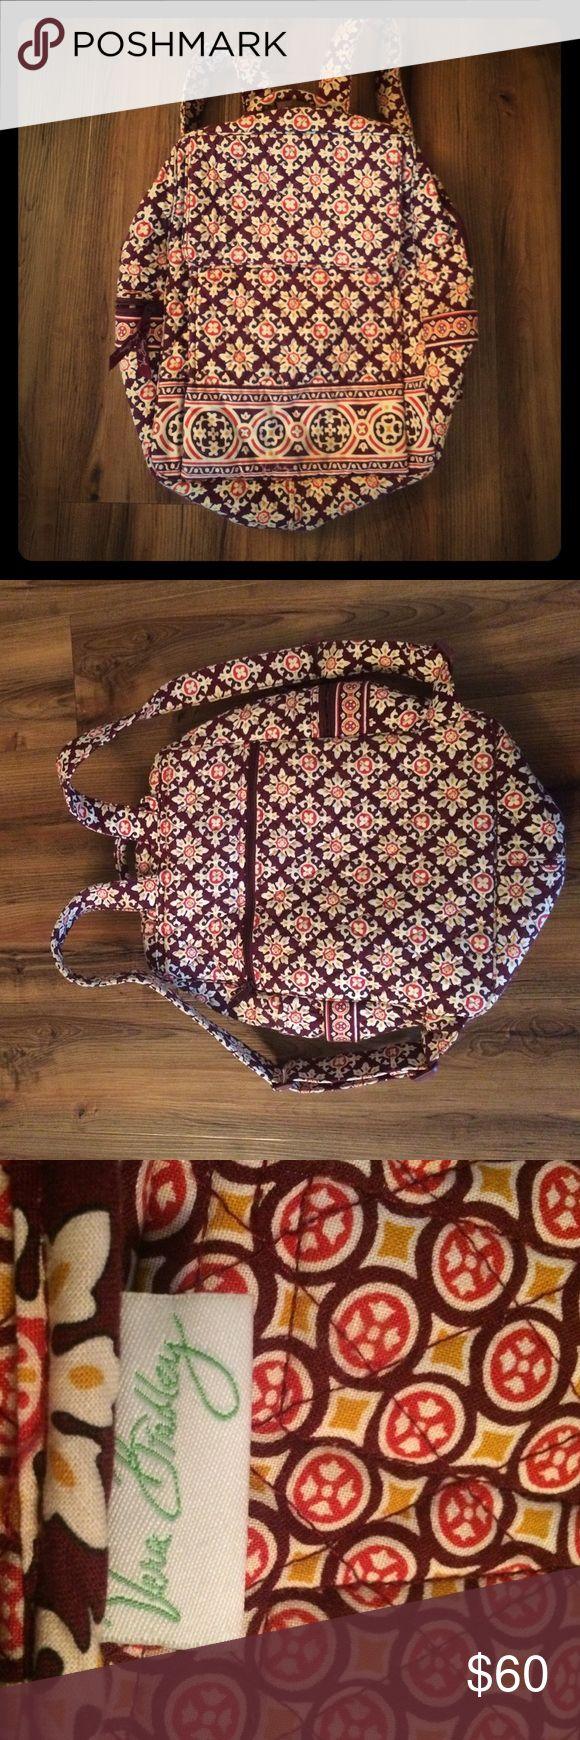 Vera Bradley Medallion Backpack Quilted backpack. Many pockets. No wear or damage. Vera Bradley Bags Backpacks